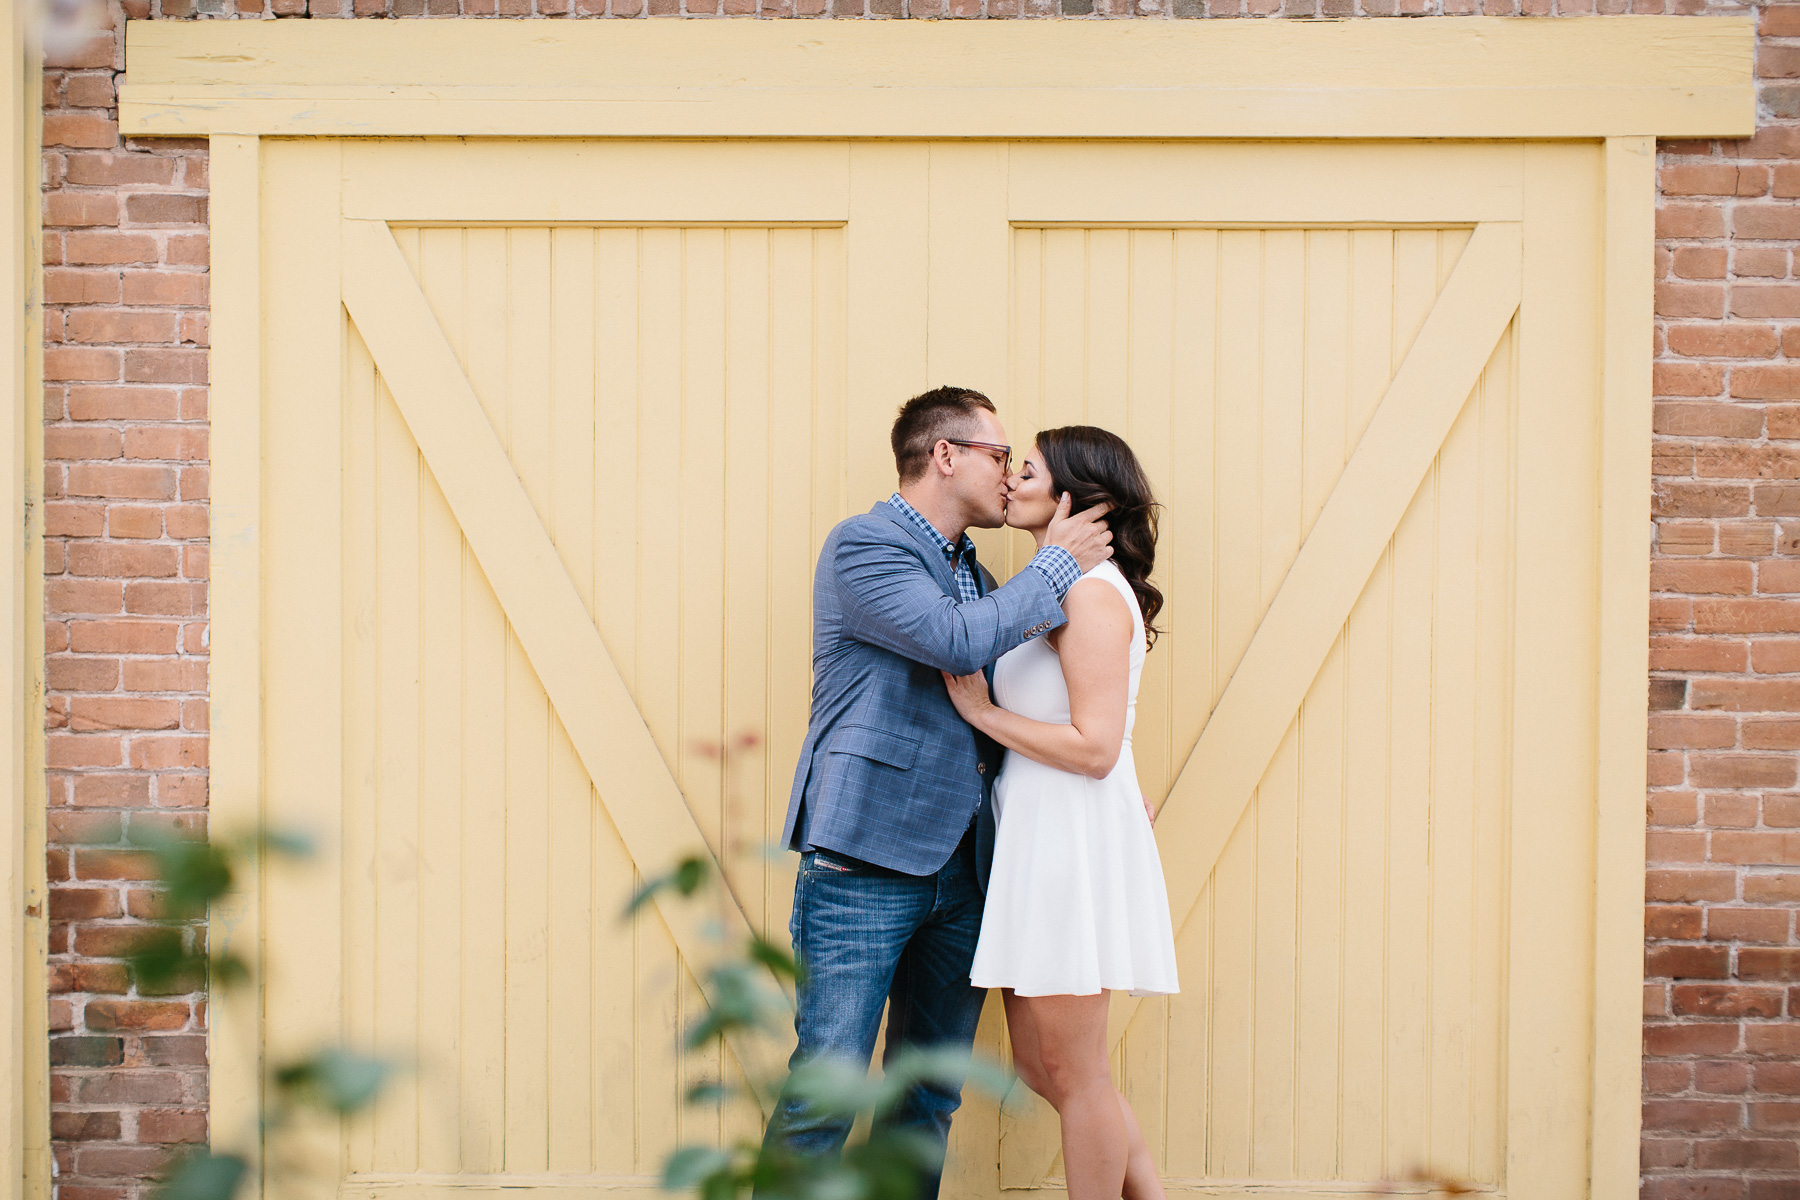 Luxium-Weddings-@matt__le-Engagement-Heritage-Square-Park-Downtown-Phoenix-Urban-Photography-101.jpg